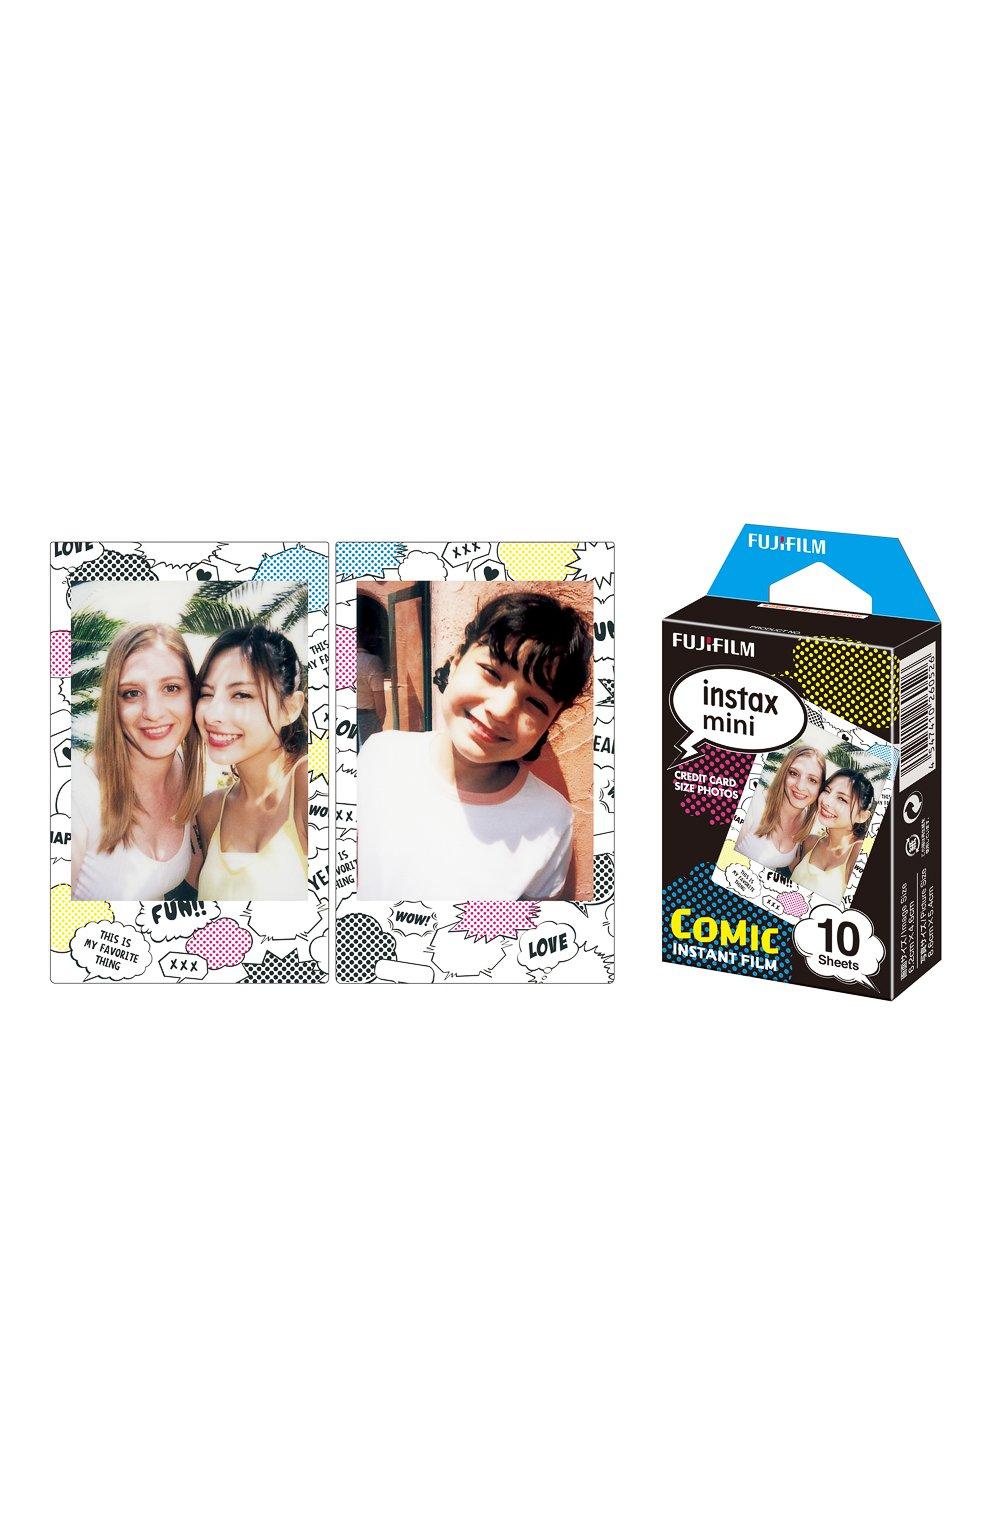 Фотопленка fujifilm instax mini comic 10 INSTAX разноцветного цвета, арт. 4547410260526 | Фото 2